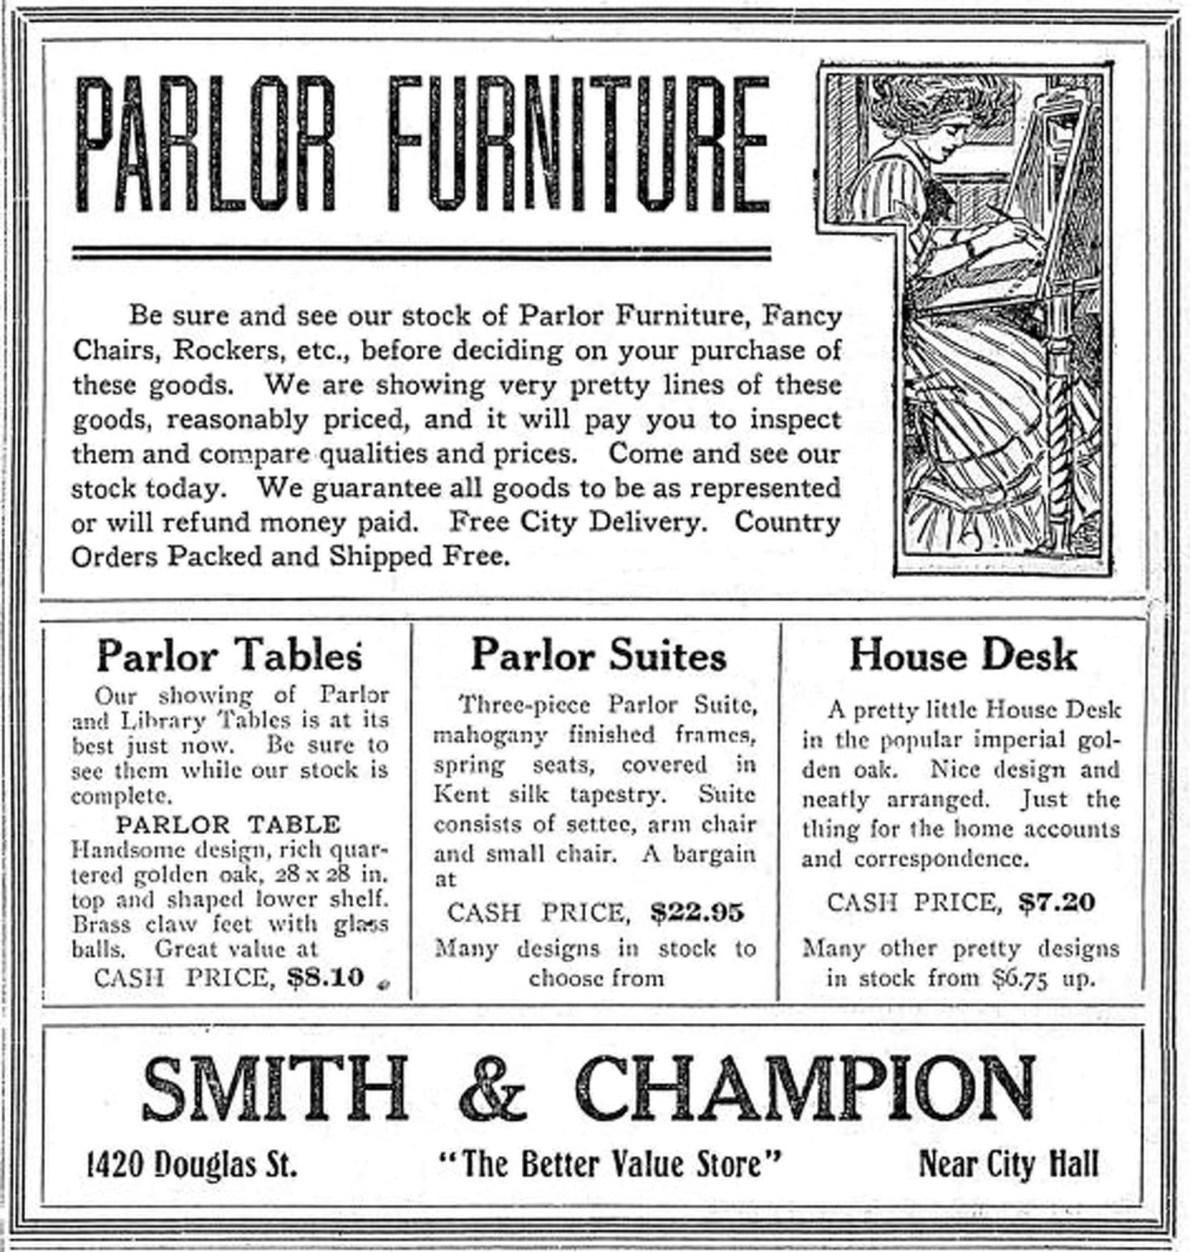 1910 Advertisement For Smith & Champion, 1420 Douglas Street